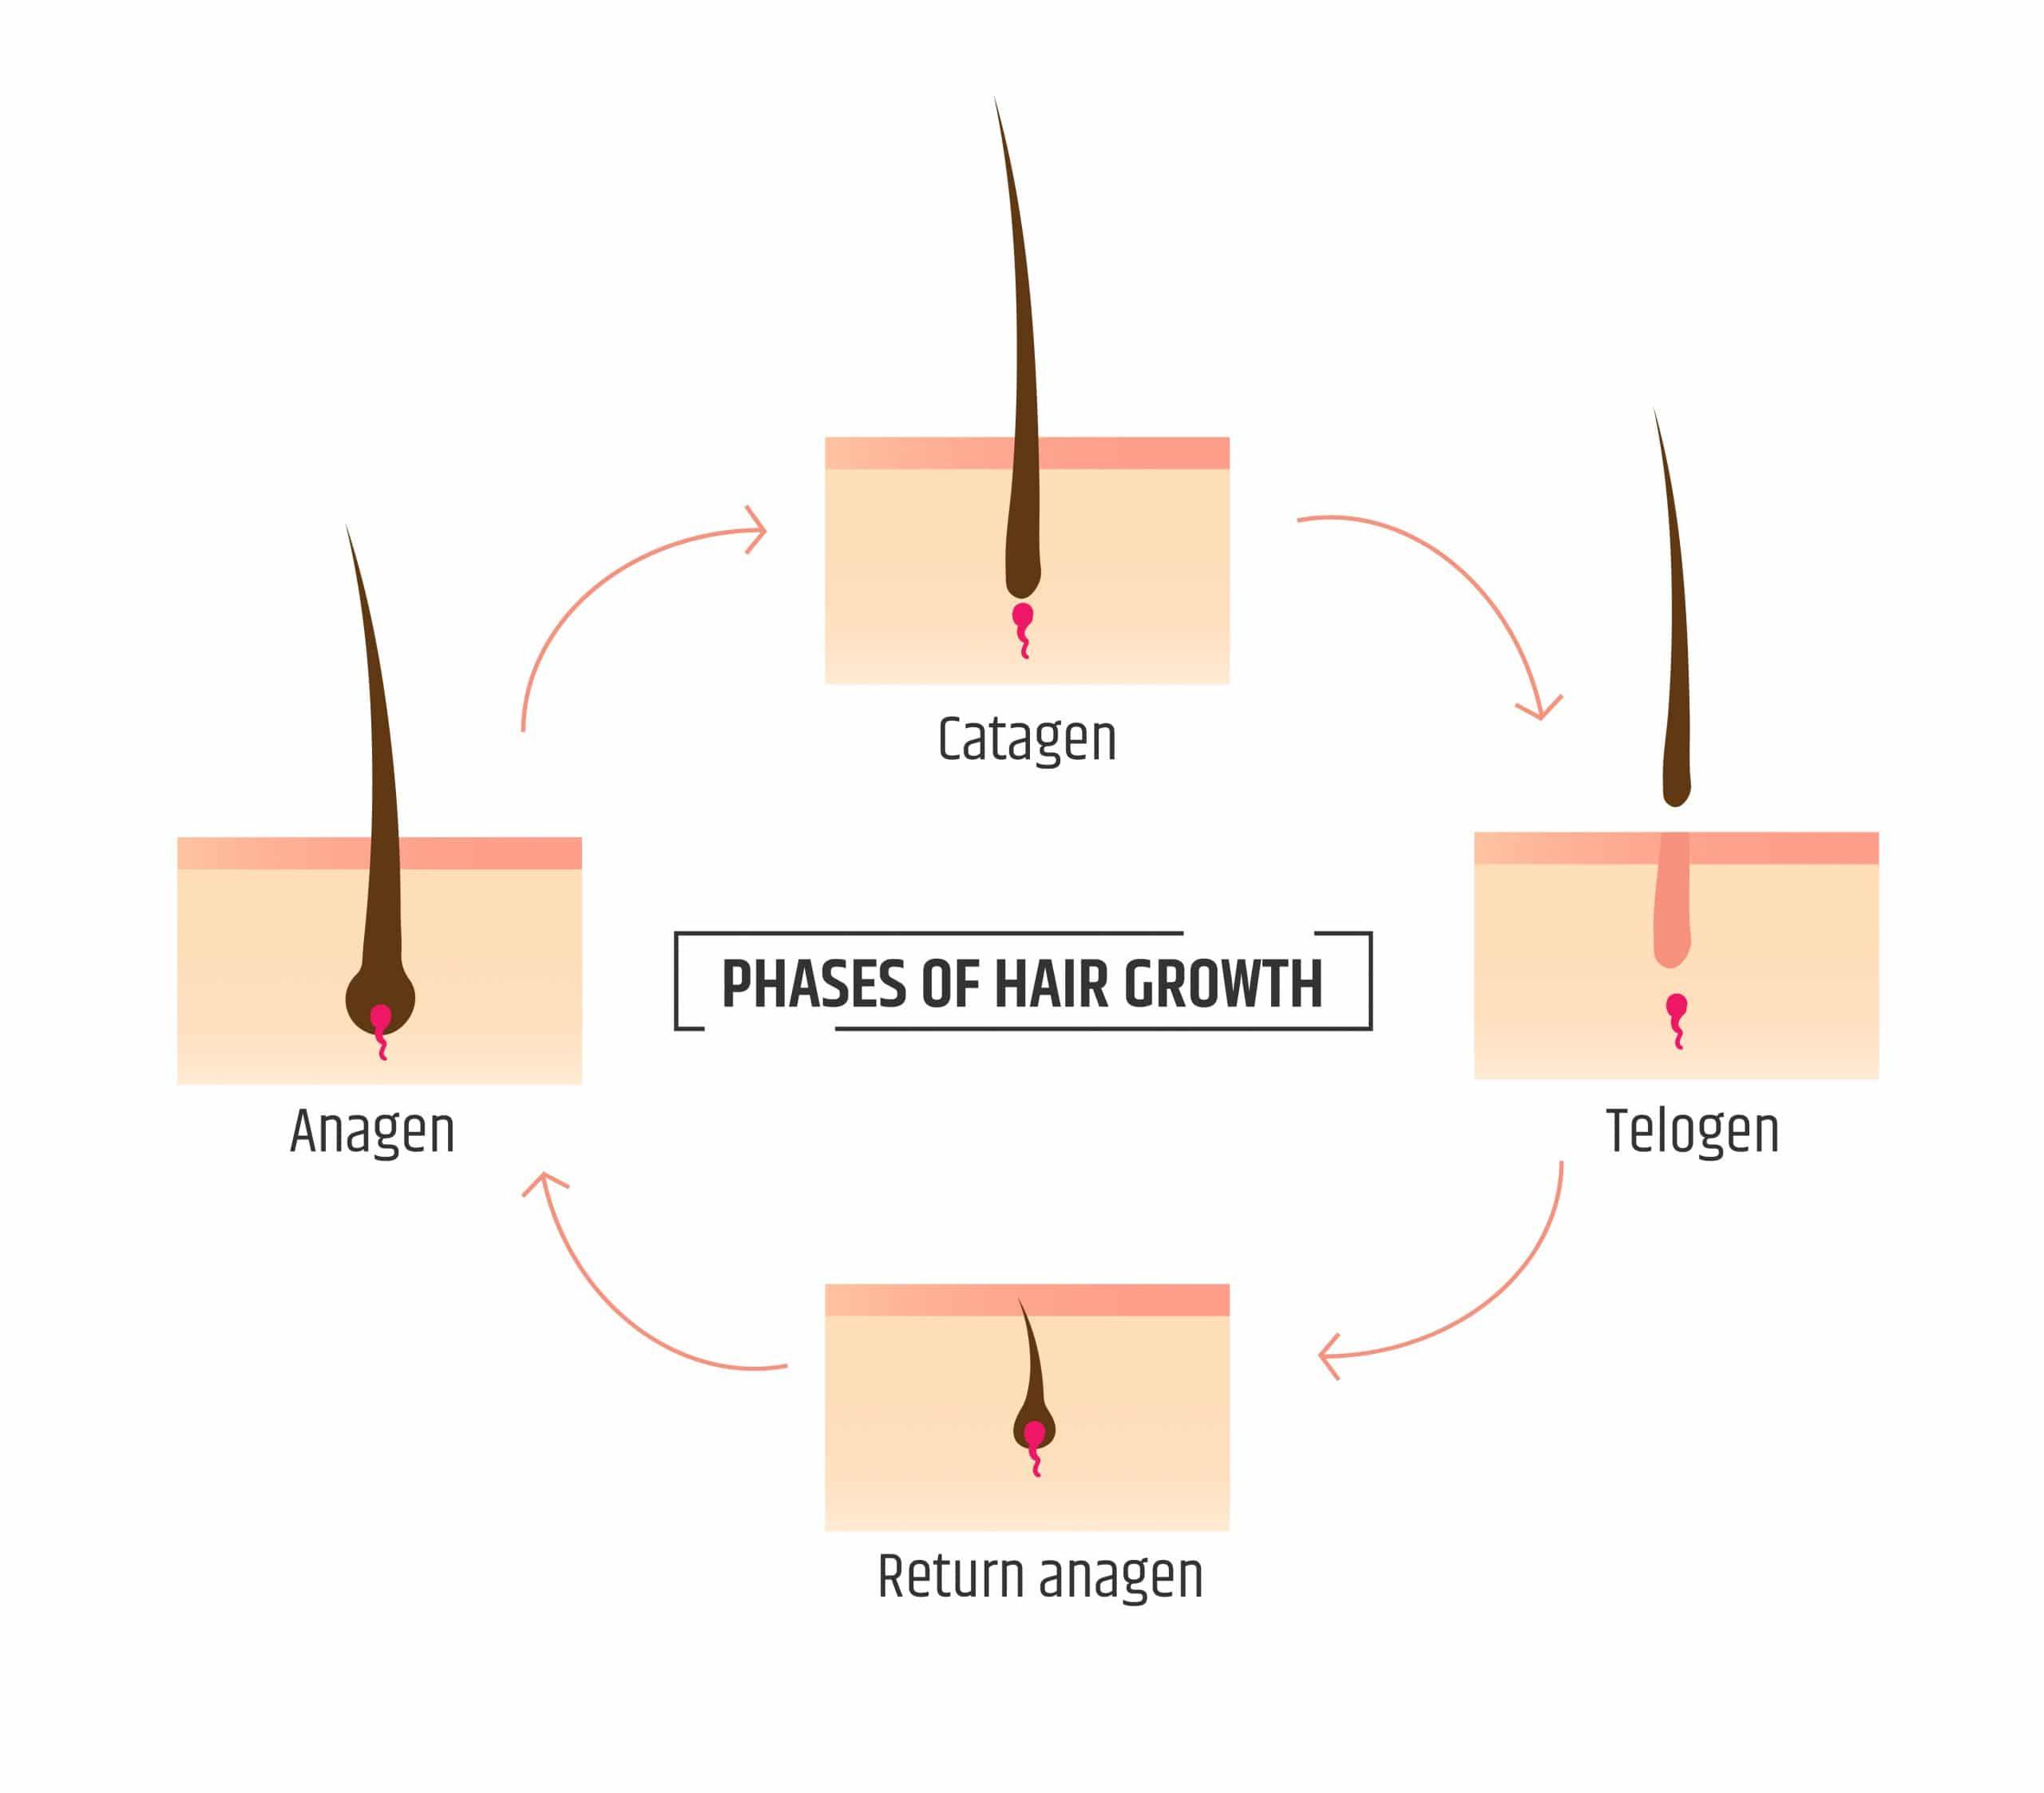 Hair growth and balding